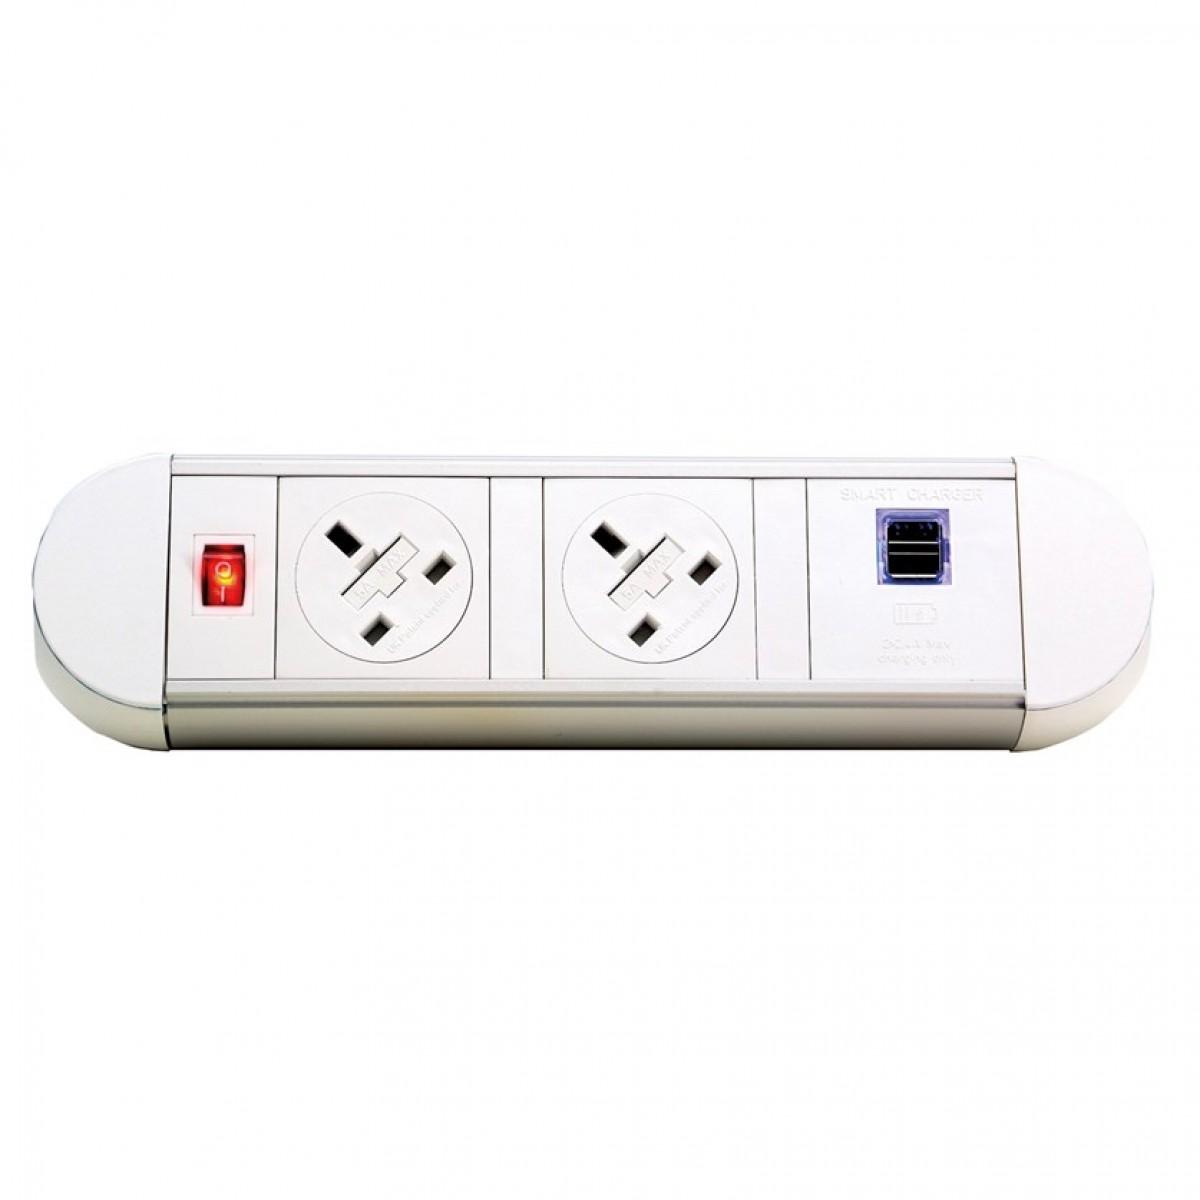 DAMS Chroma clip-on power module 2 x UK sockets, 1 x twin USB fast charge